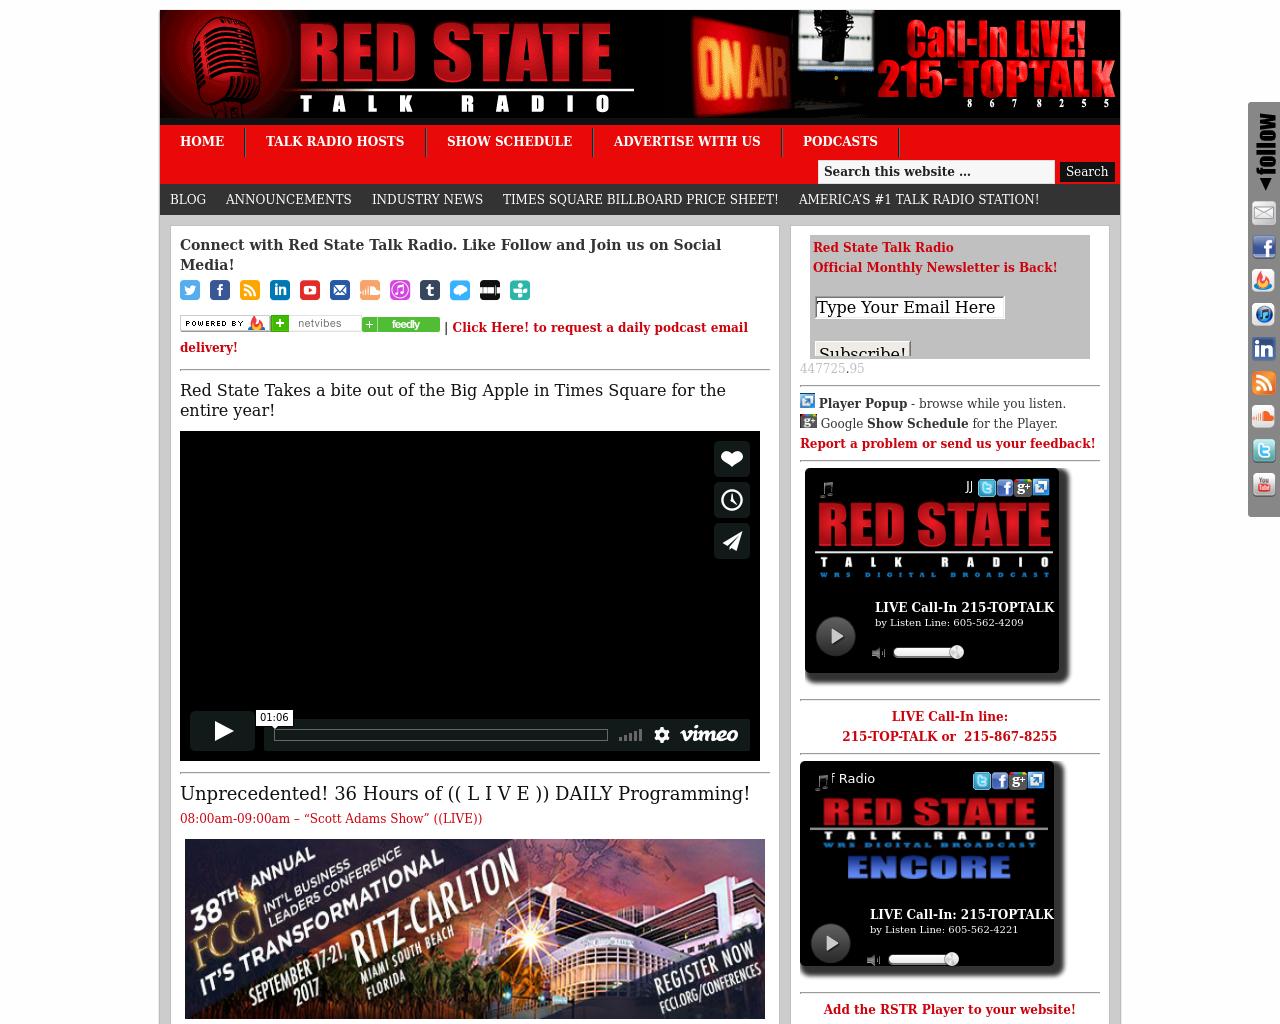 Red-State-Talk-Radio-Advertising-Reviews-Pricing